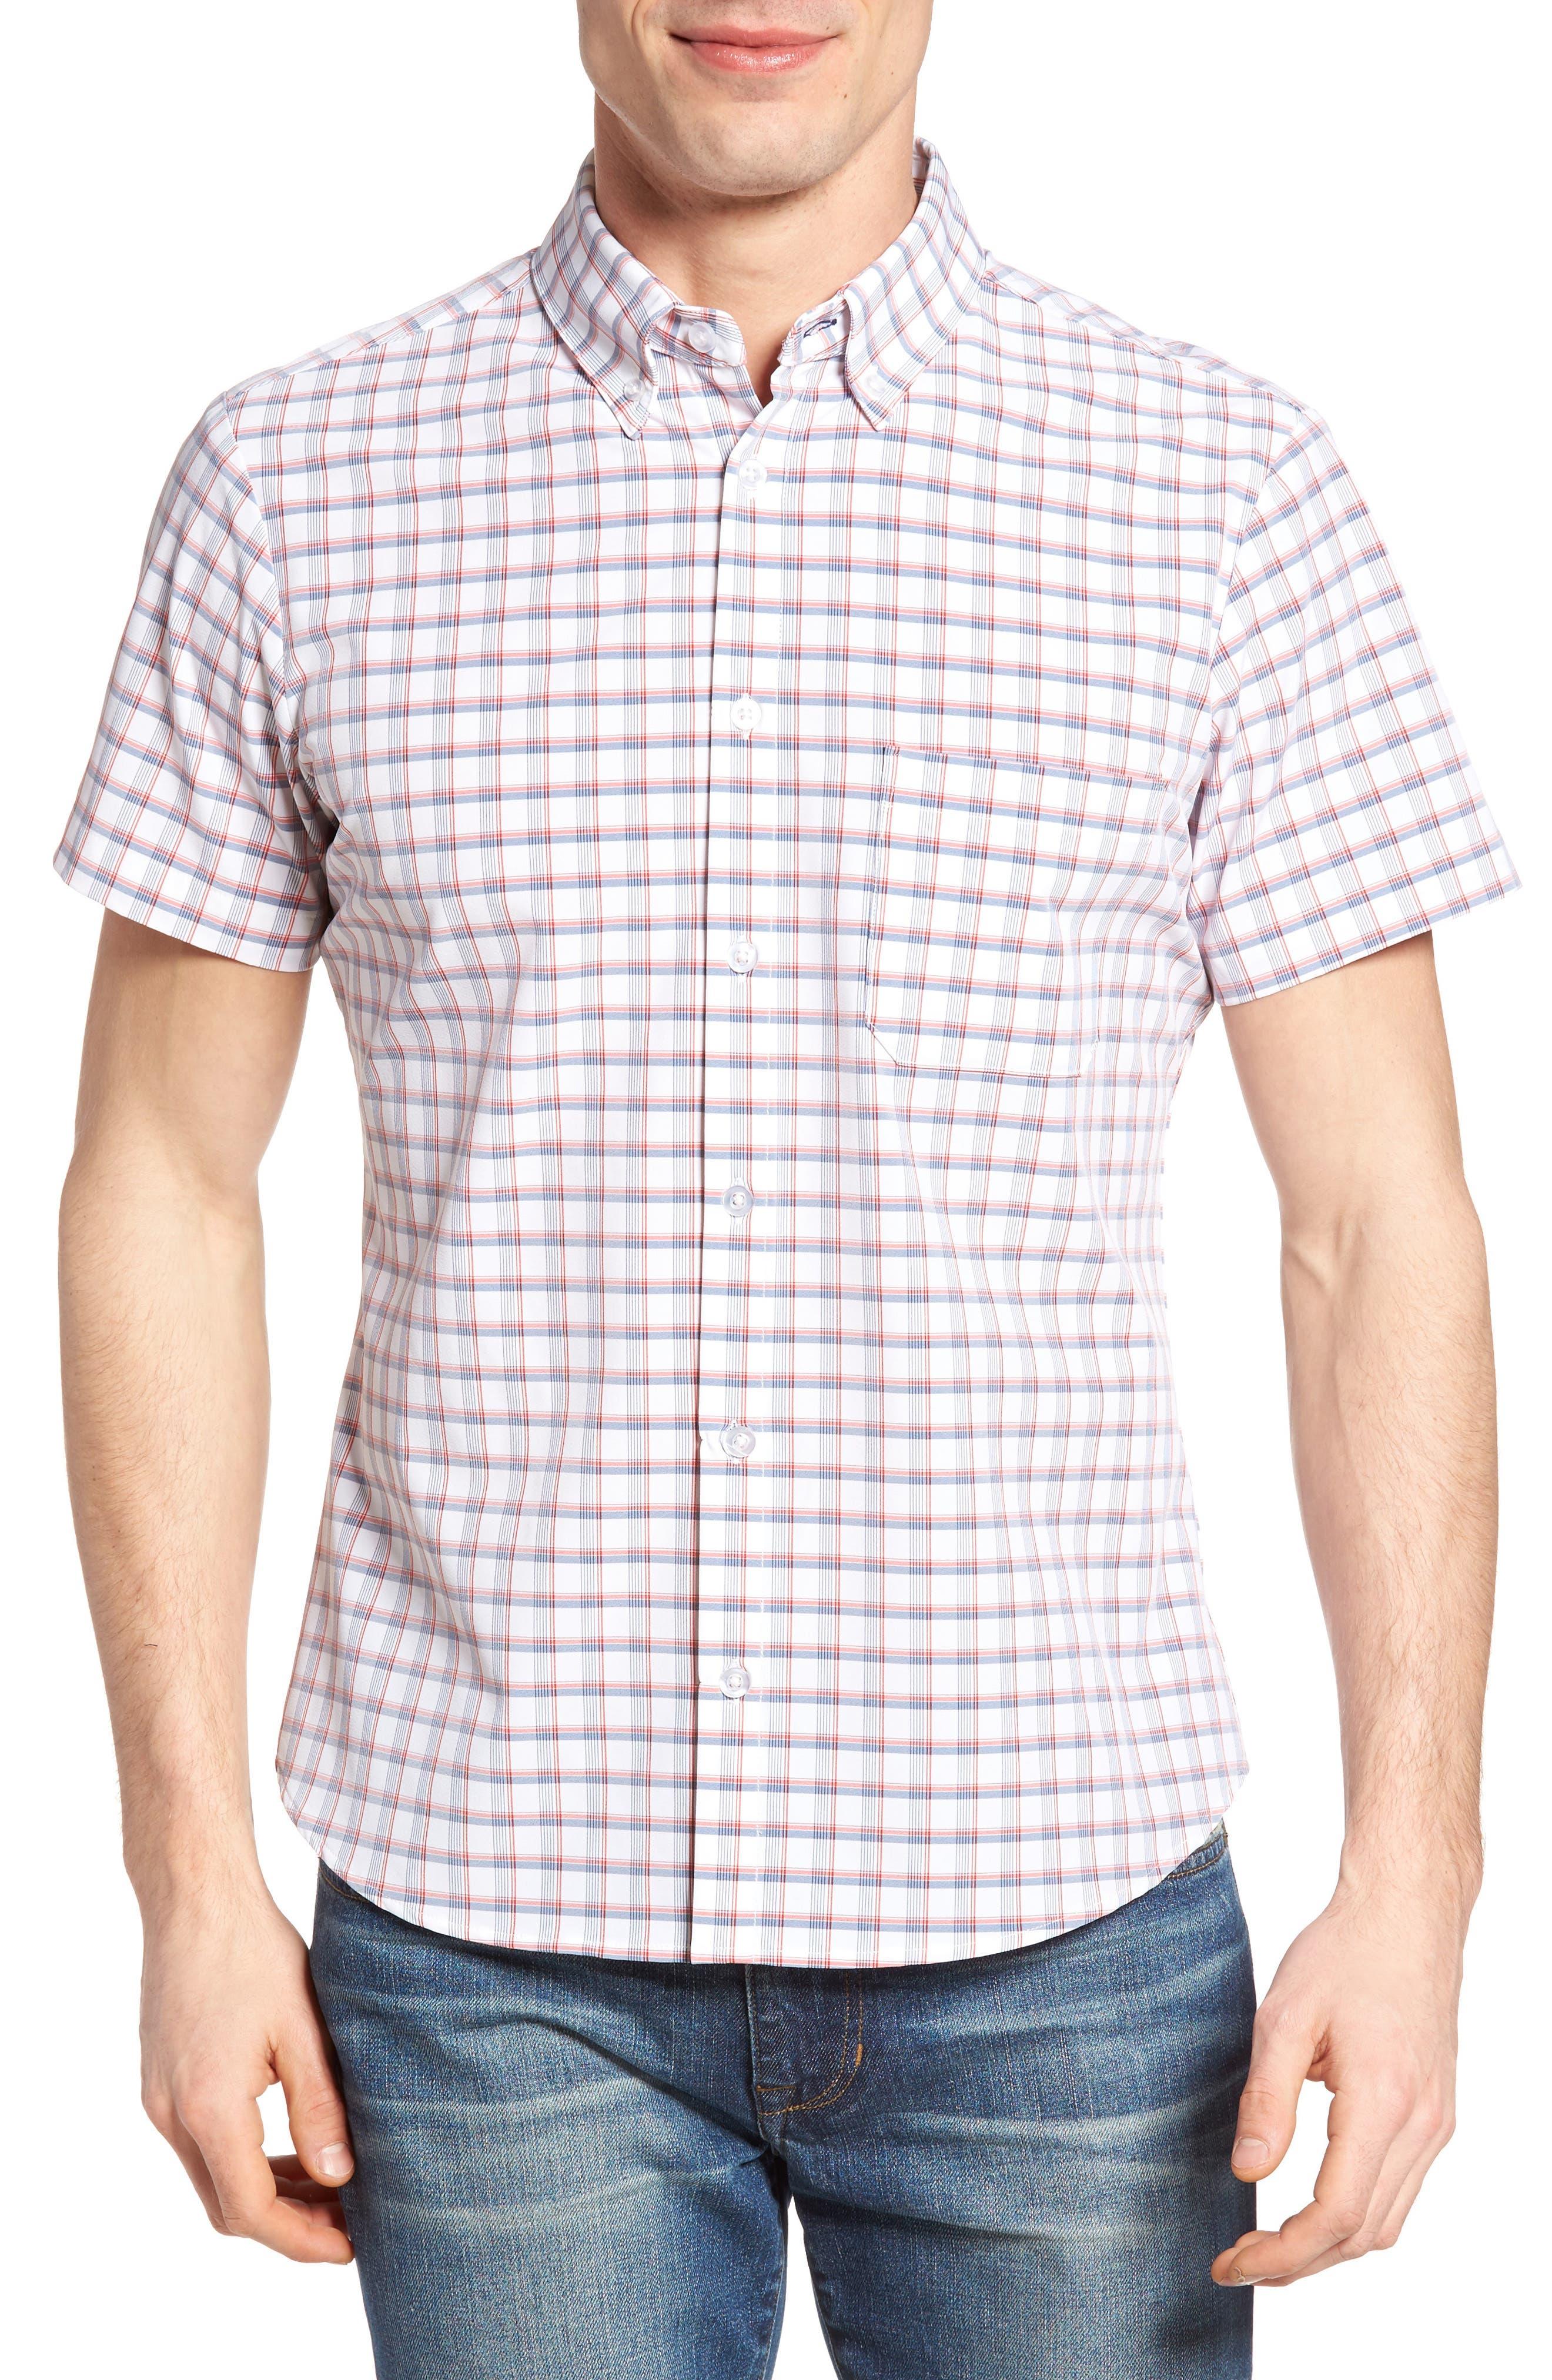 Sanford Slim Fit Plaid Performance Sport Shirt,                             Main thumbnail 1, color,                             600